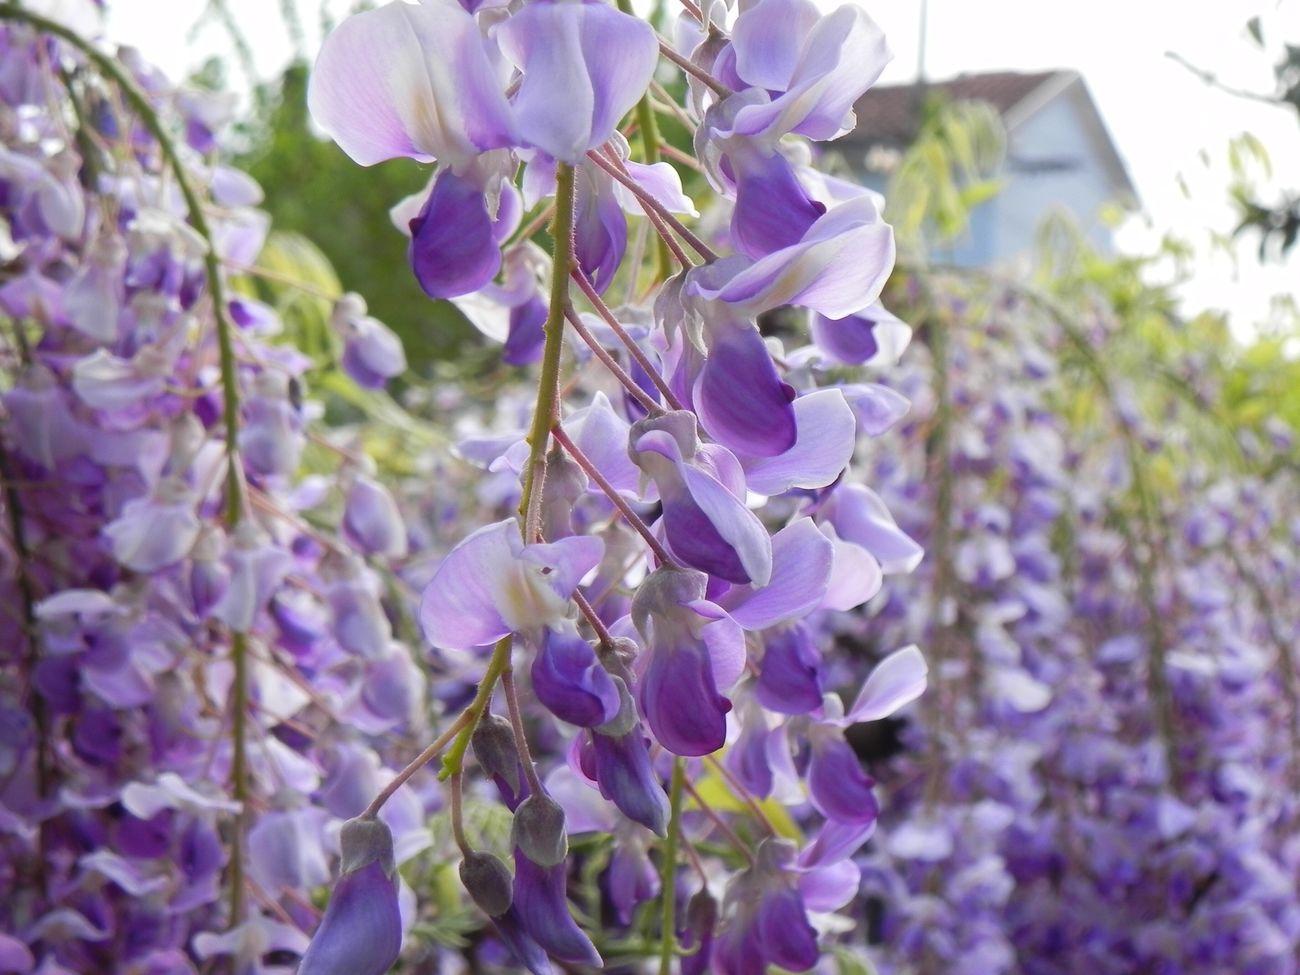 Photo by Nikon p100, Glicine Flower First Eyeem Photo